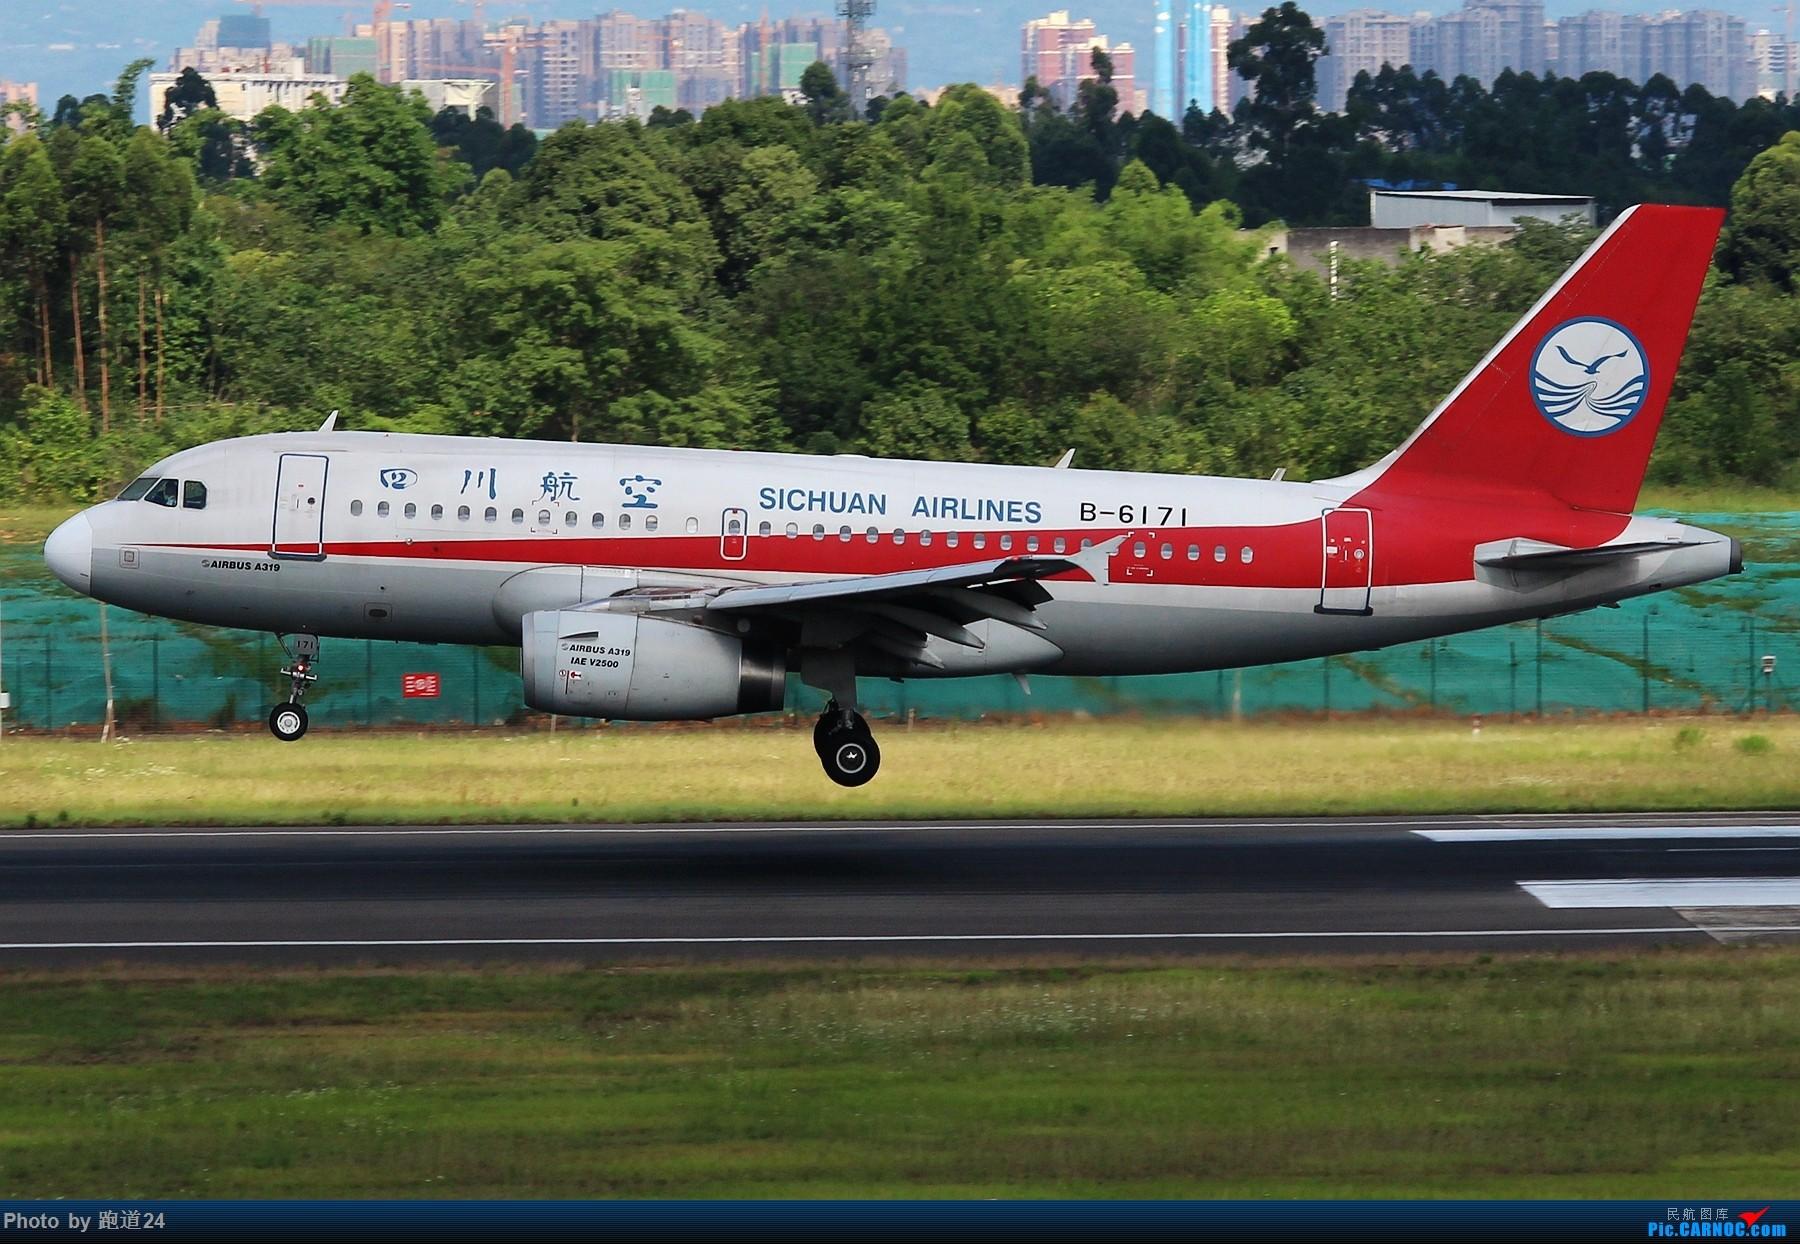 Re:[原创]【多图党】6月18日成都拍机【埃塞俄比亚航空B777-200LR】 AIRBUS A319-100 B-6171 中国成都双流国际机场